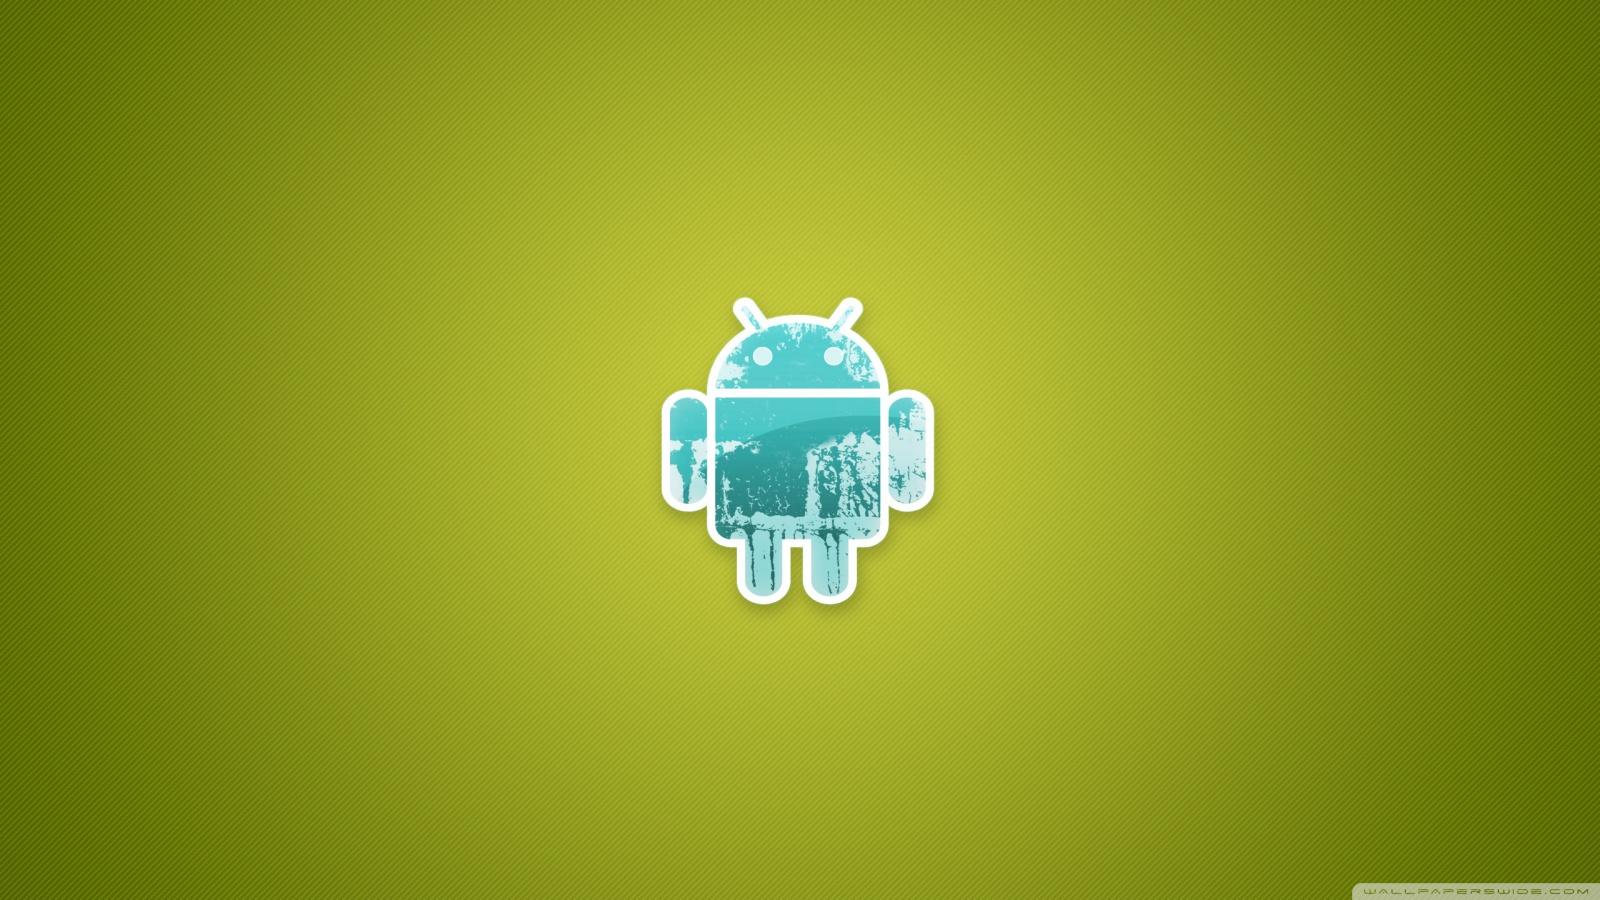 Android Minimalism HD desktop    High Definition HD Wallpaper